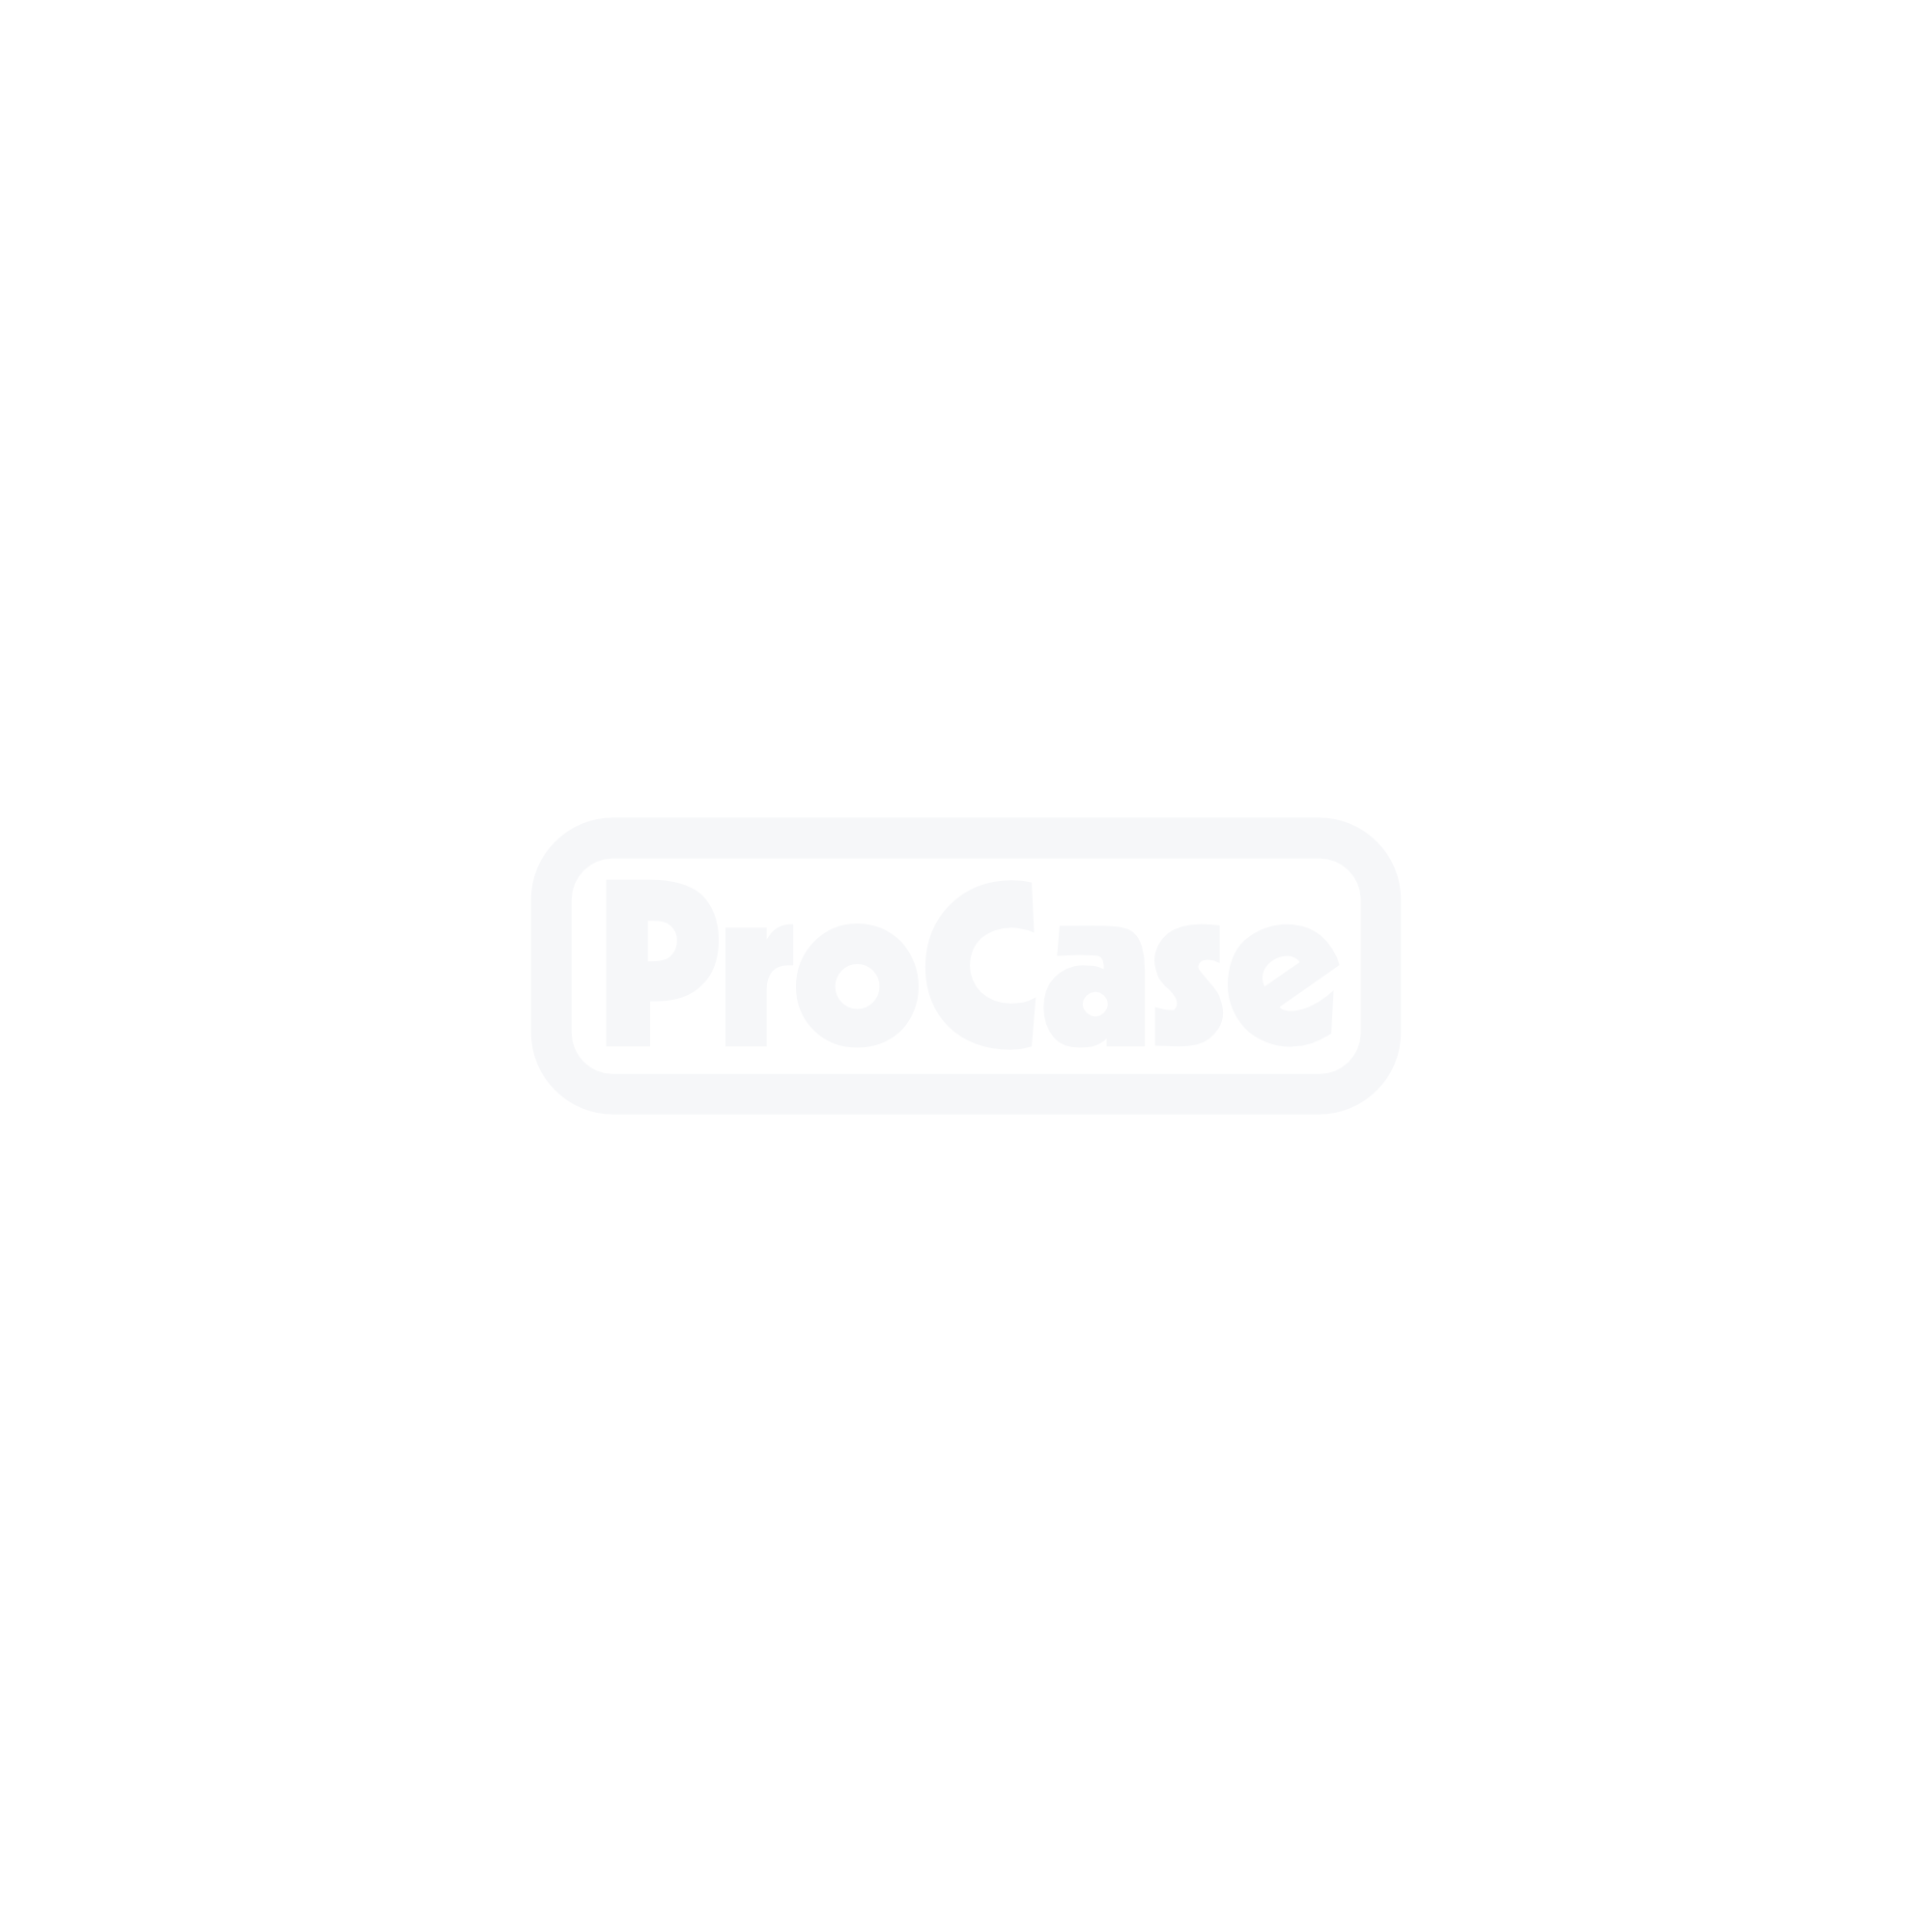 Transportkoffer für Grass Valley K2 Dyno S Replay Controller